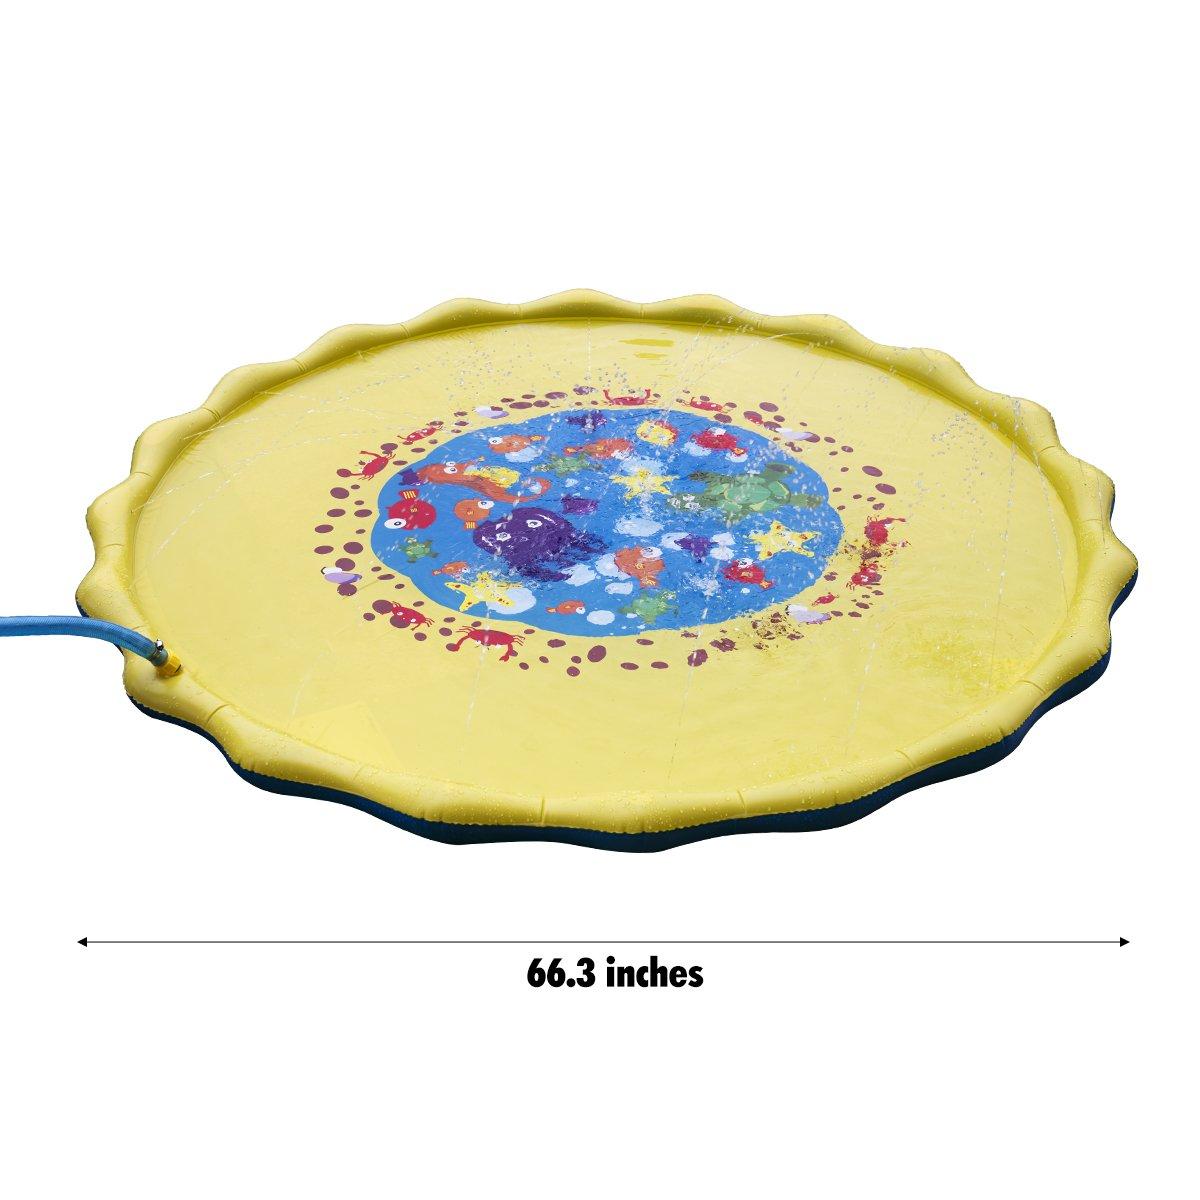 HALOFUN 67in-Diameter Sprinkle and Splash Play Mat for Kids (Yellow) by HALOFUN (Image #6)